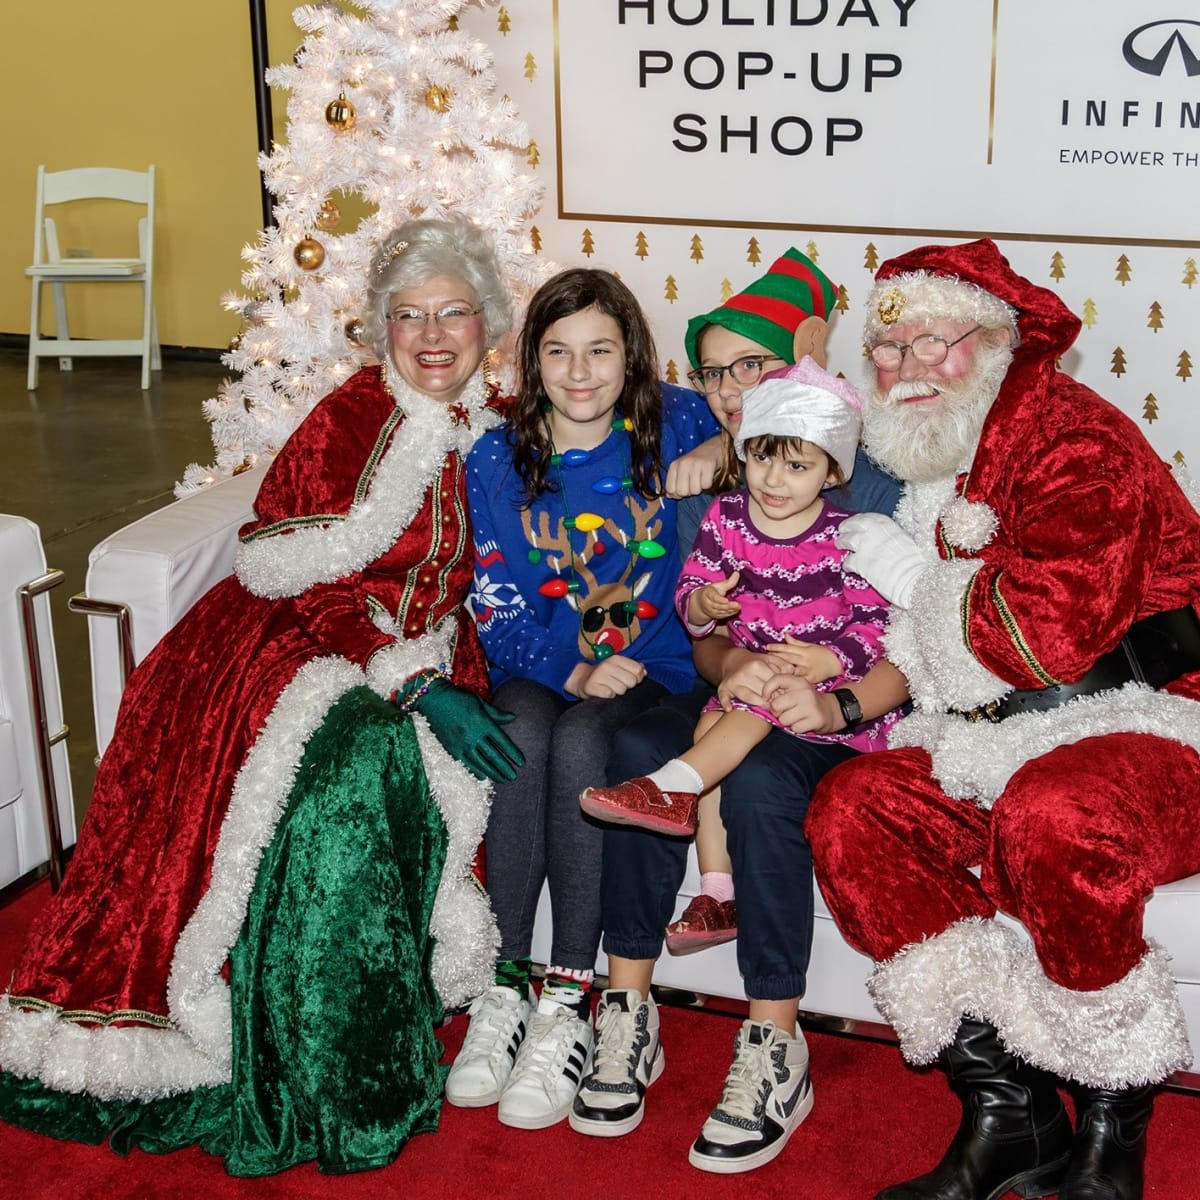 Santa pictures, CultureMap Holiday Pop-up Shop 2017